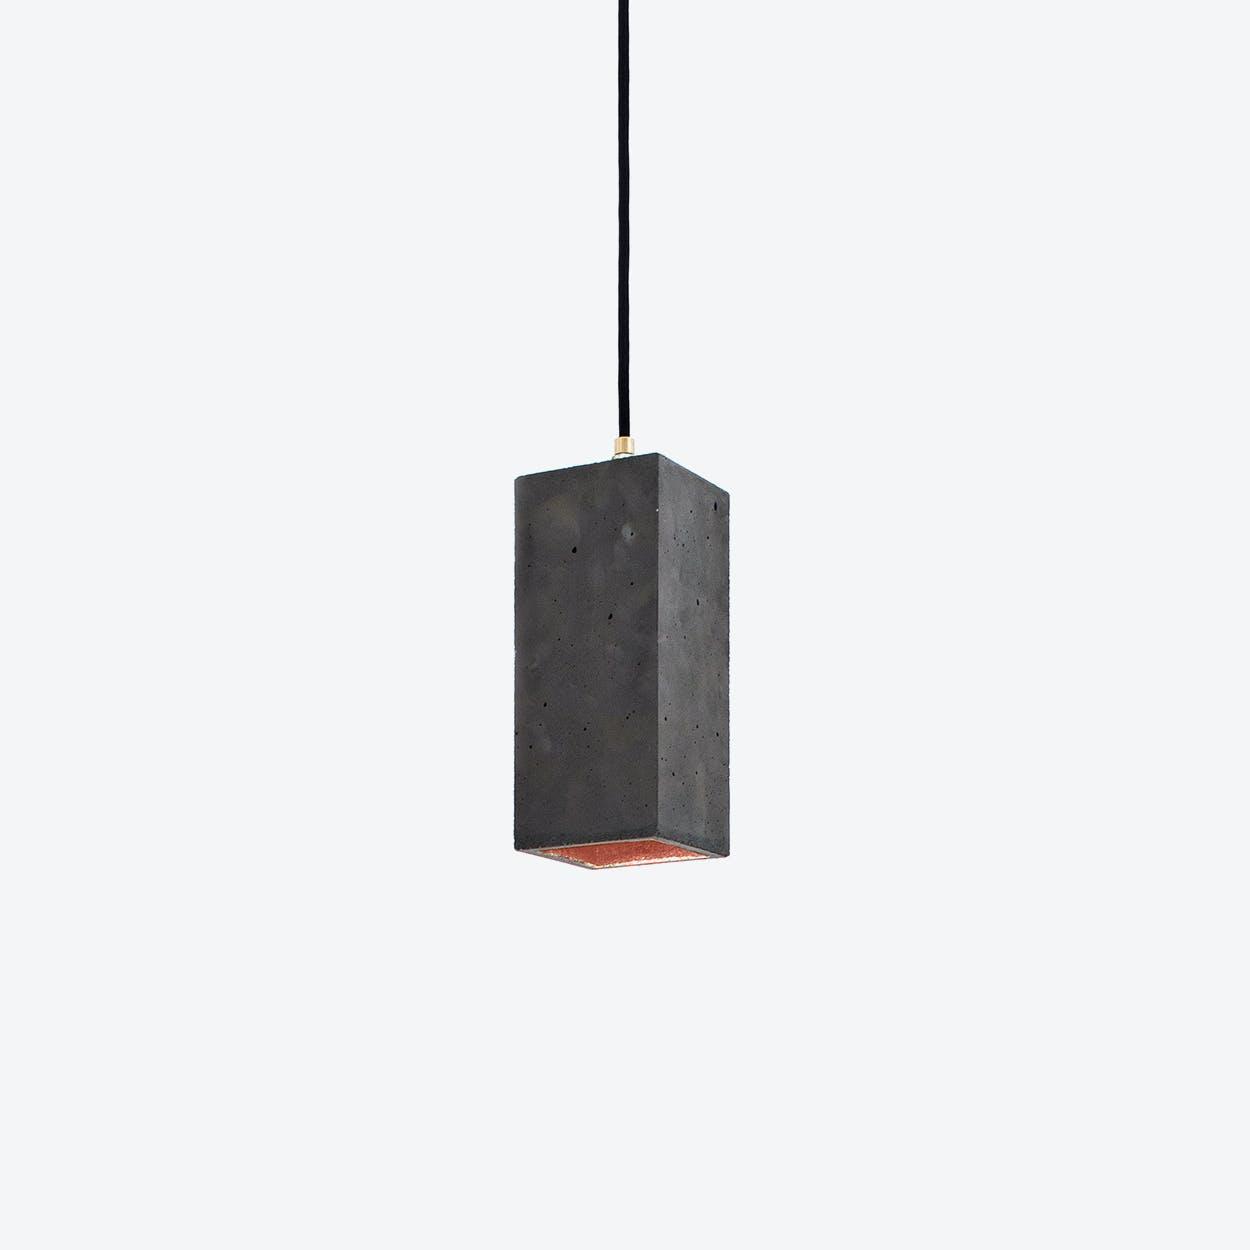 Concrete Pendant Light Retangular B2 in Dark Grey and Copper